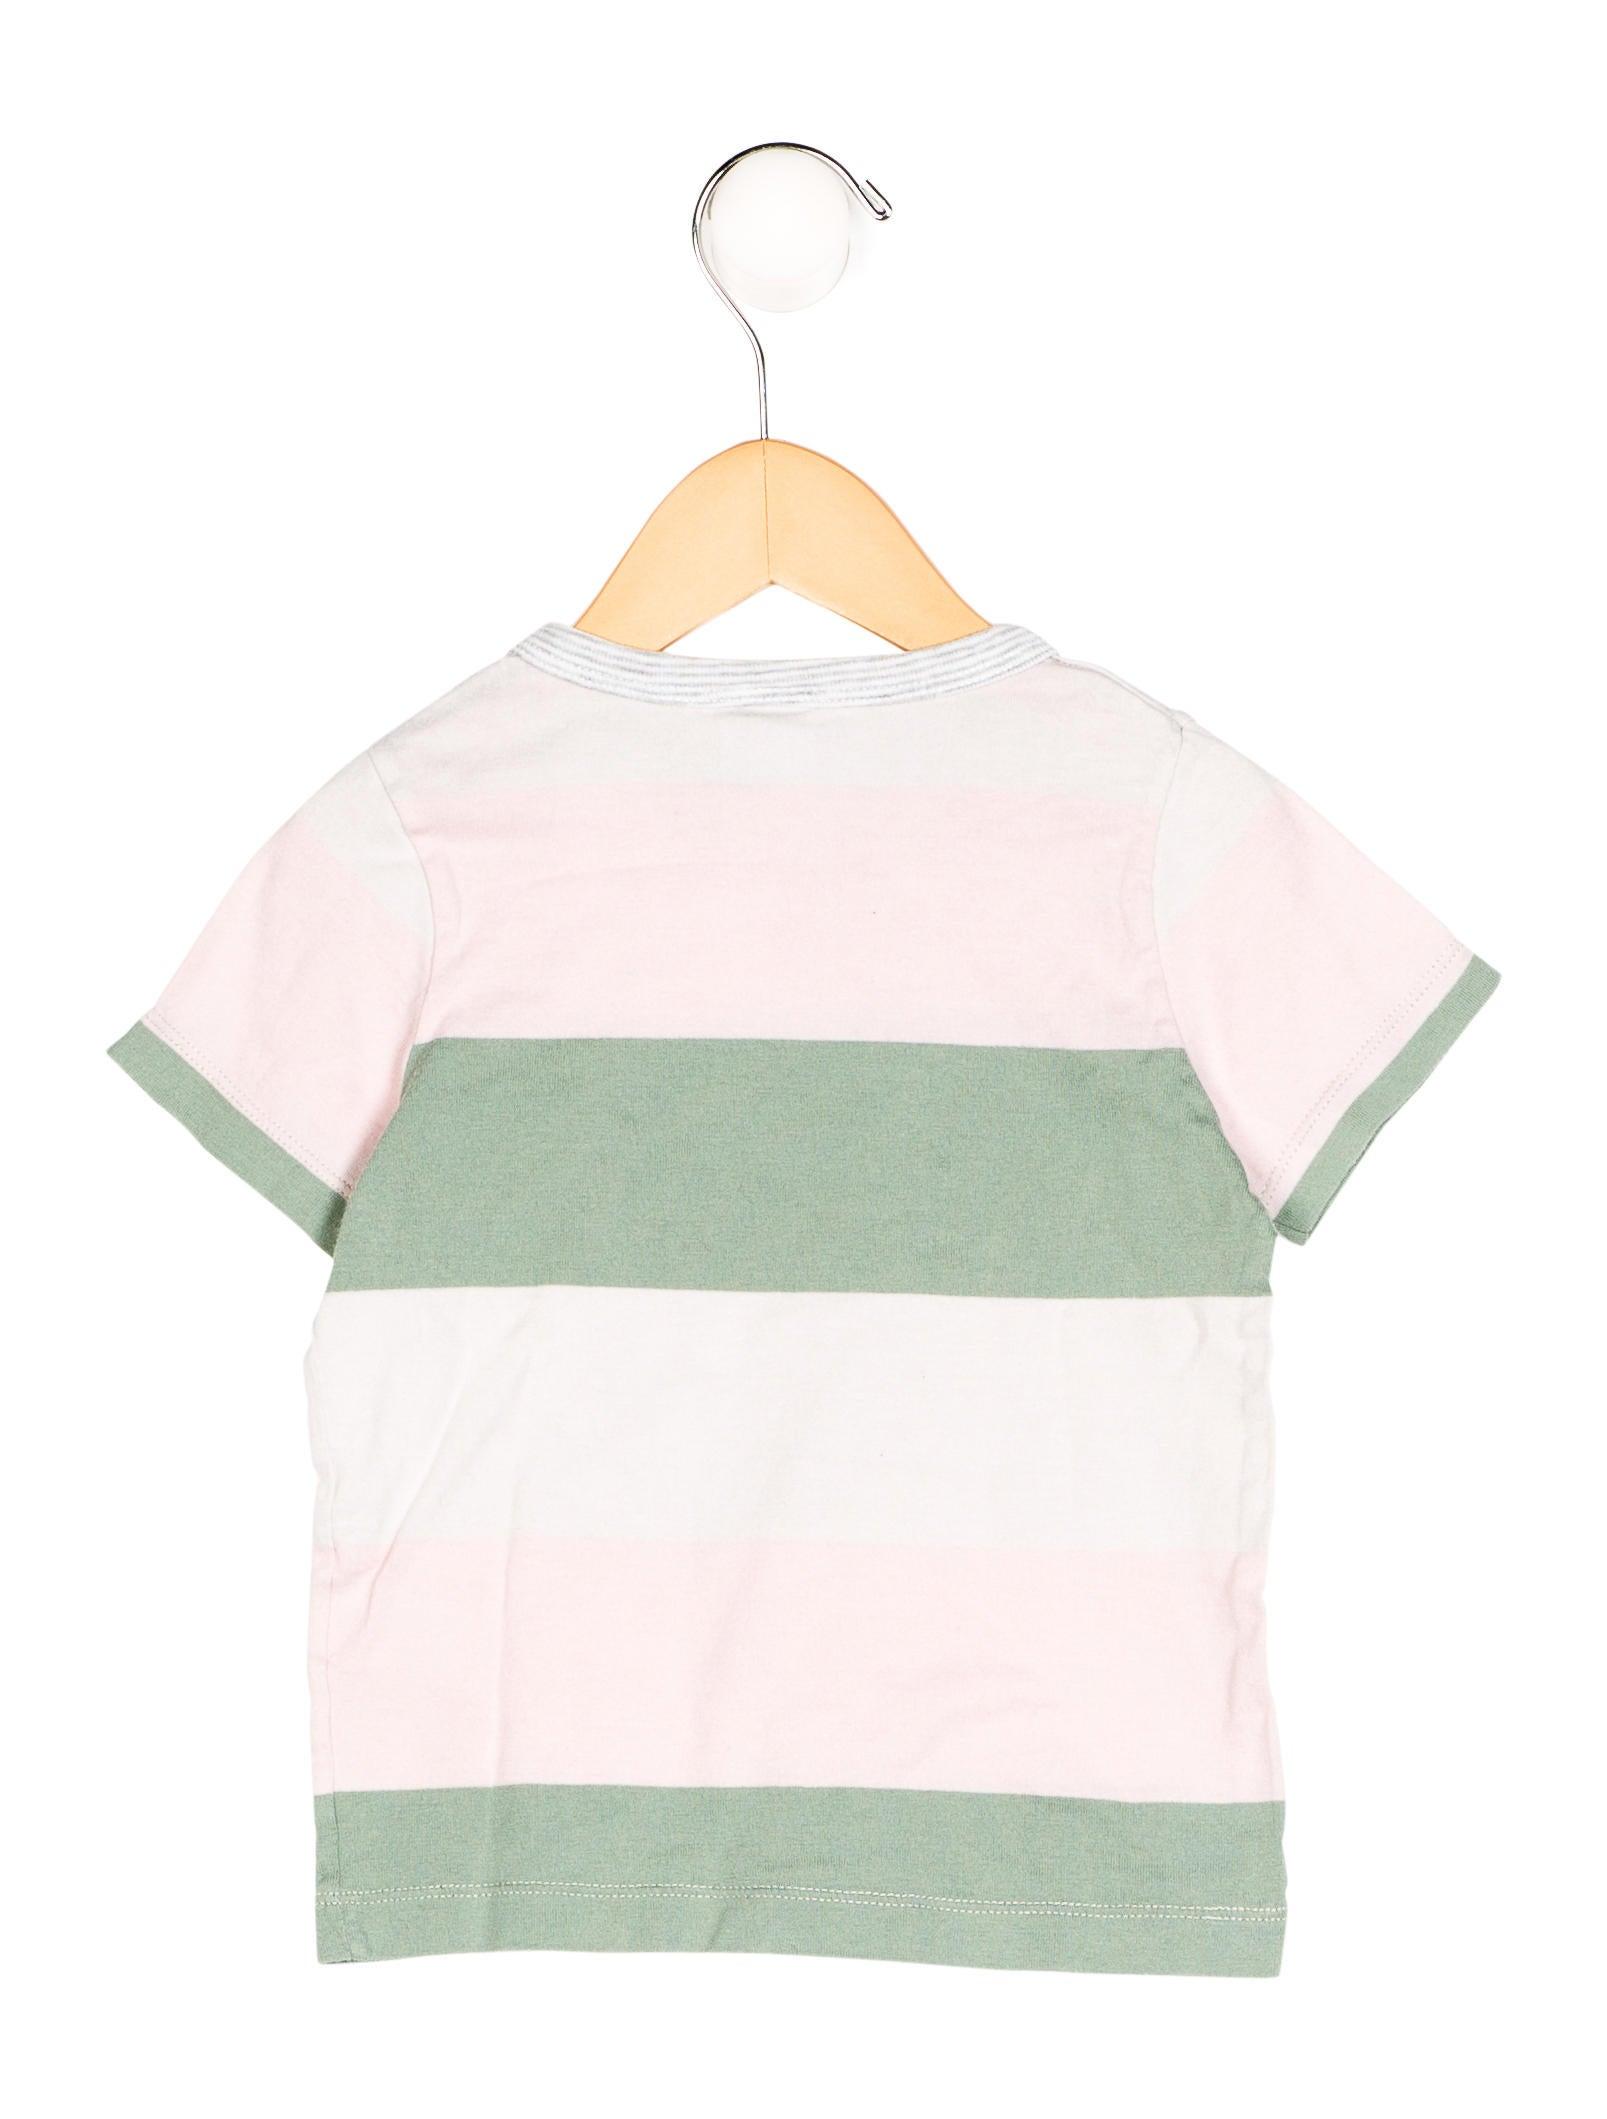 Petit bateau boys 39 striped short sleeve shirt wpeti20581 for Petit bateau striped shirt